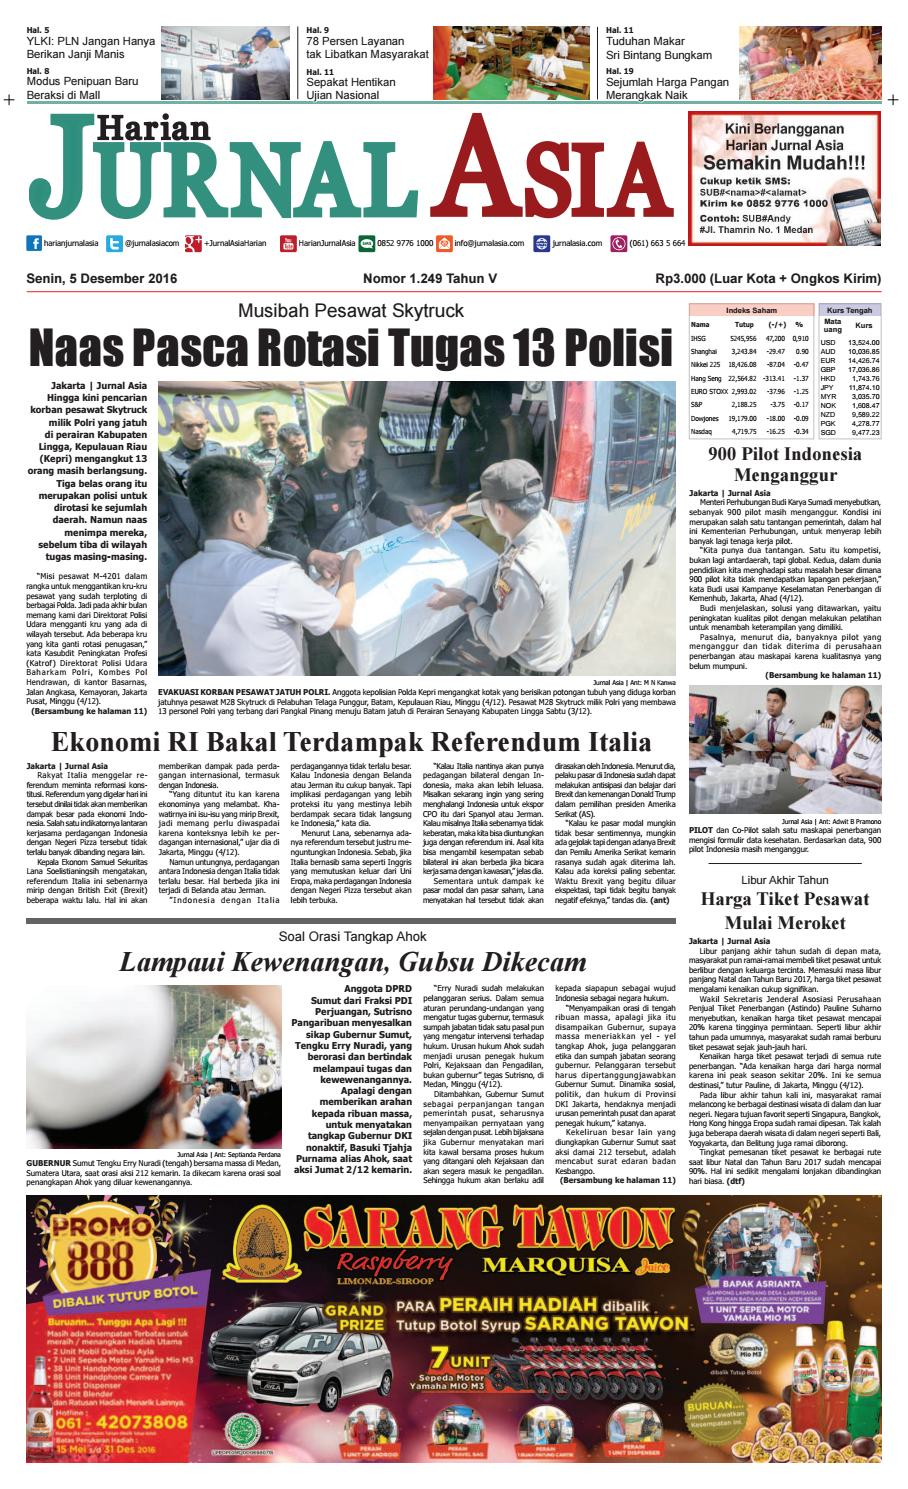 Harian Jurnal Asia Edisi Senin 05 Desember 2016 By Kue Bakpia Kuliner Yulis Saekowati Akumandiri Medan Issuu